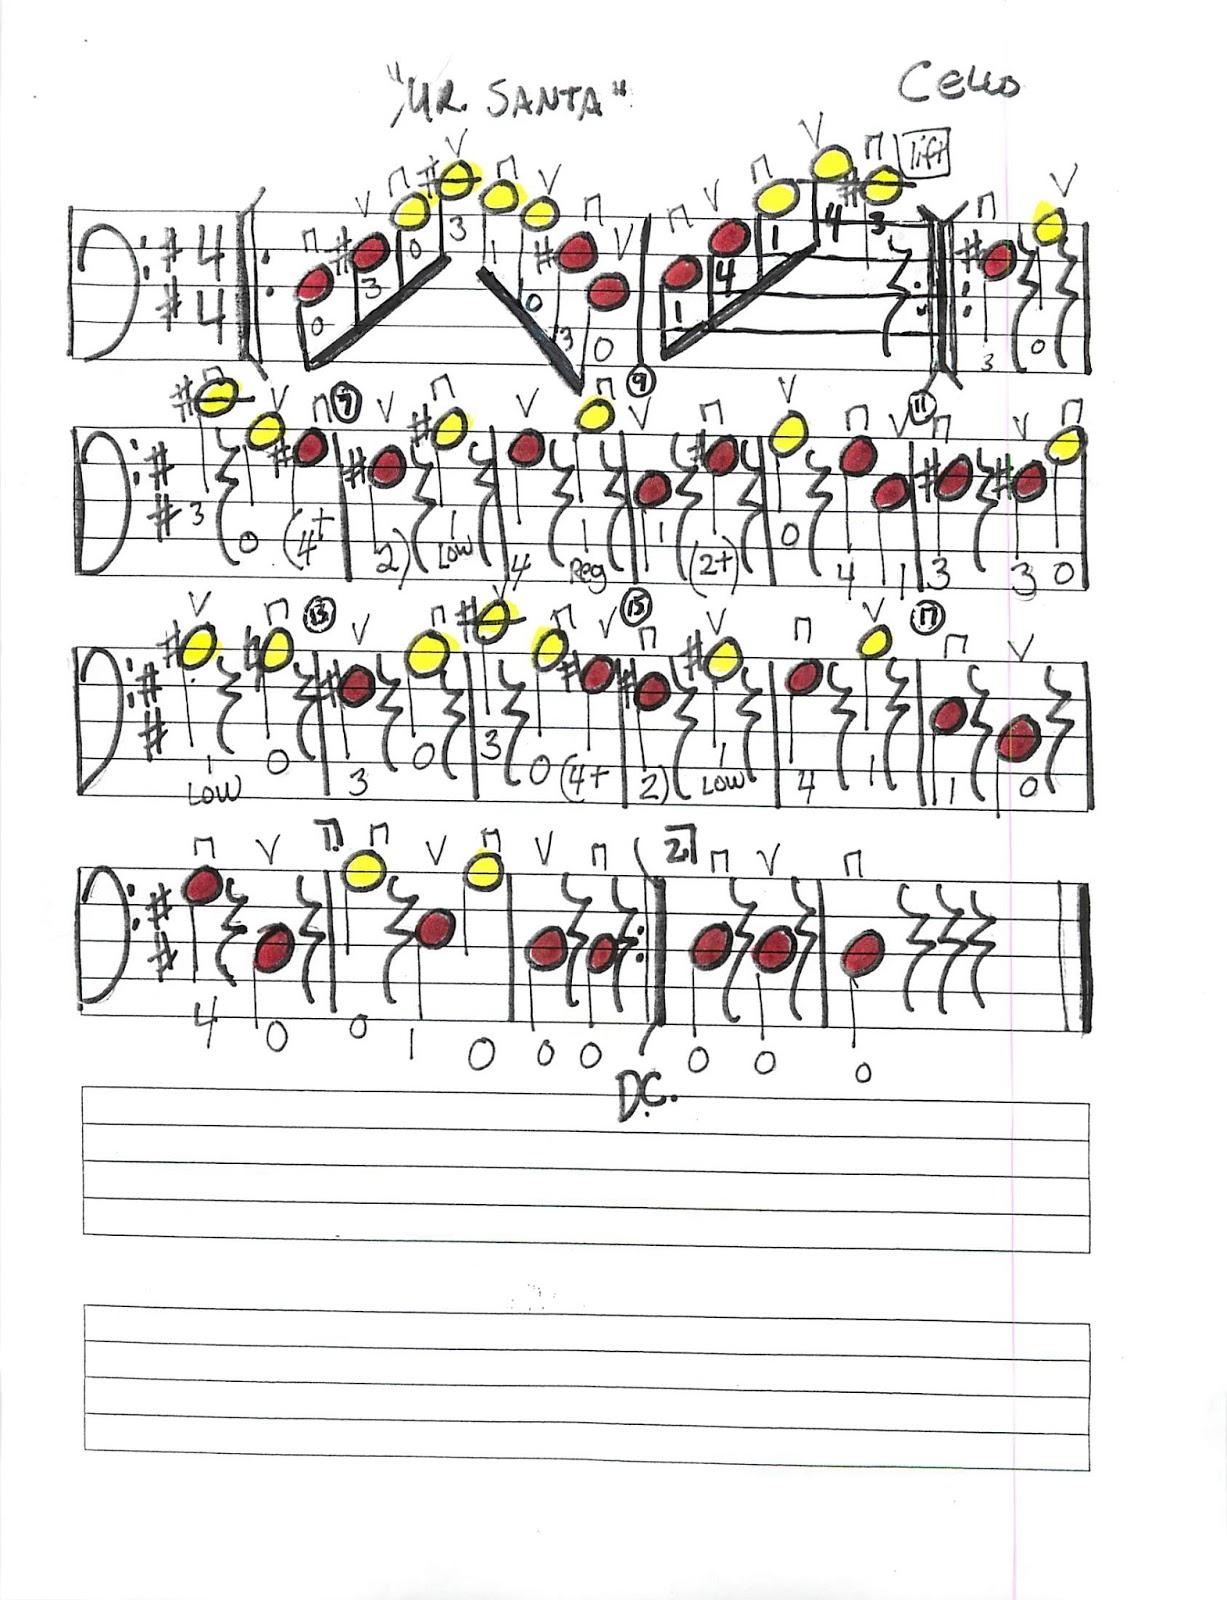 Miss Jacobson's Music: WINTER CONCERT MUSIC 2013: MR. SANTA